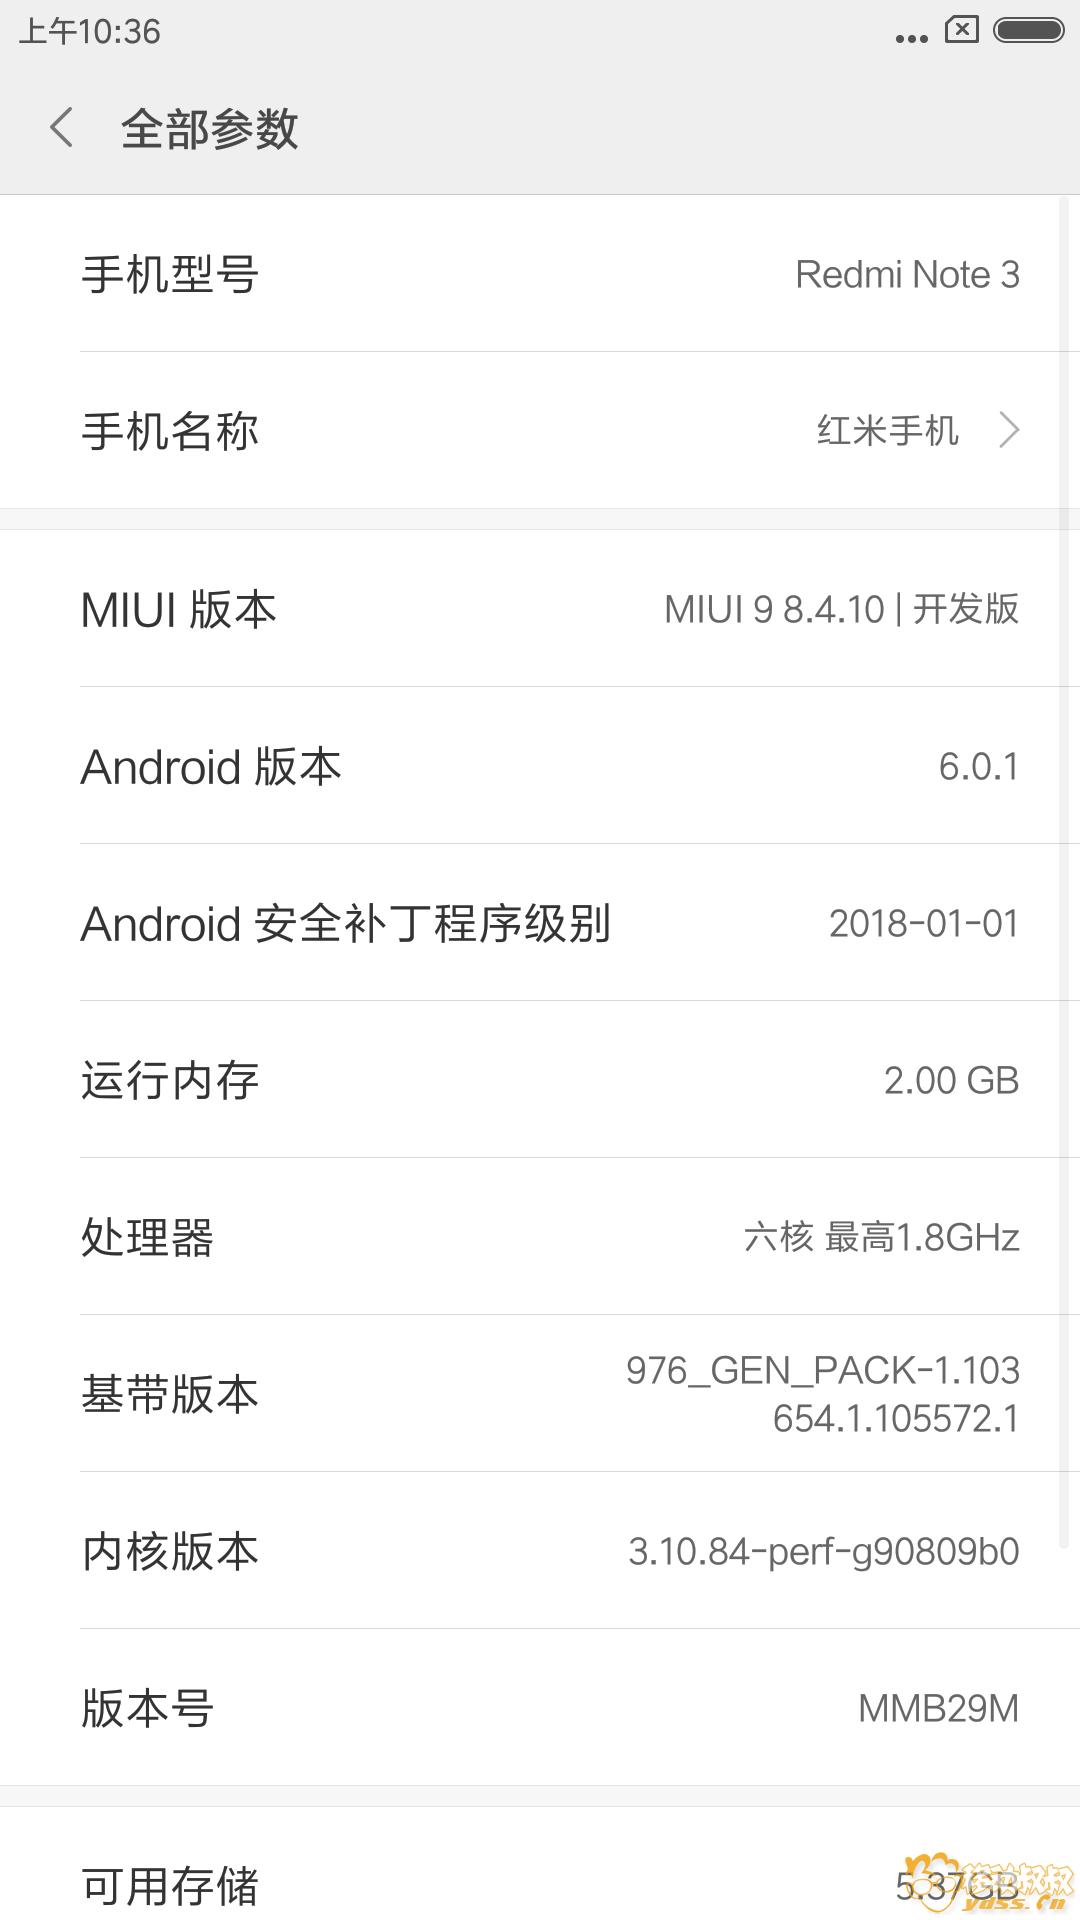 Screenshot_2018-04-10-10-36-37-088_com.android.settings.png